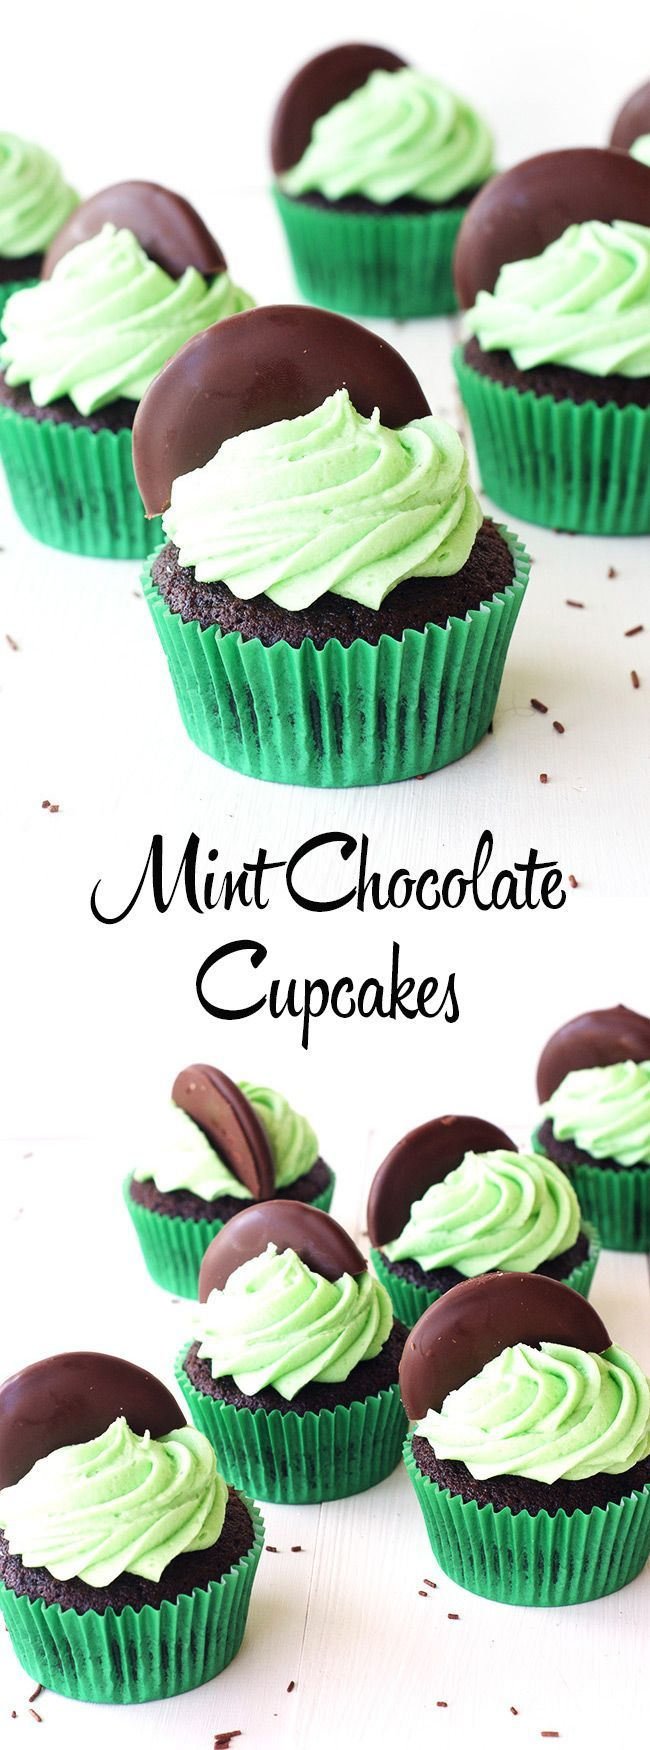 Easy Mint Chocolate Cupcakes | Sweetest Menu